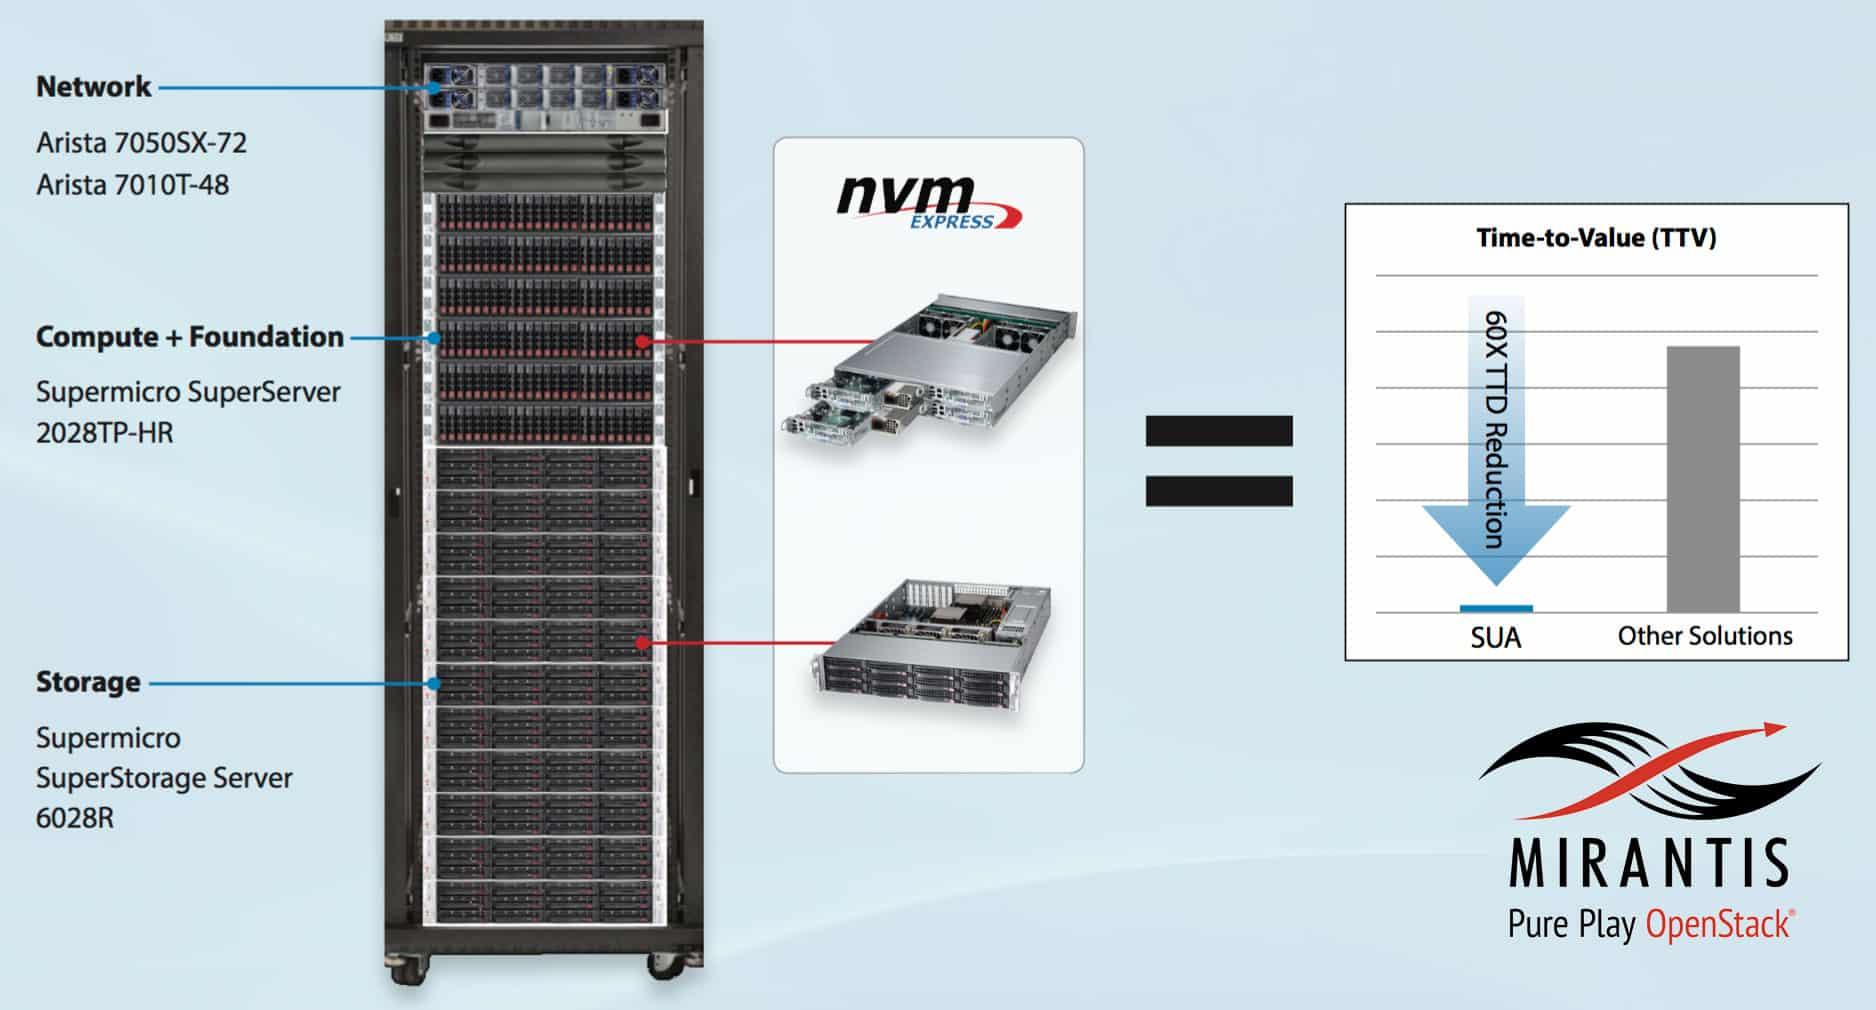 Supermicro เสนอ Cloud Solution Rack จาก OpenStack Mirantis รองรับ 1,000 VM ตอบโจทย์ Cloud สำหรับองค์กร